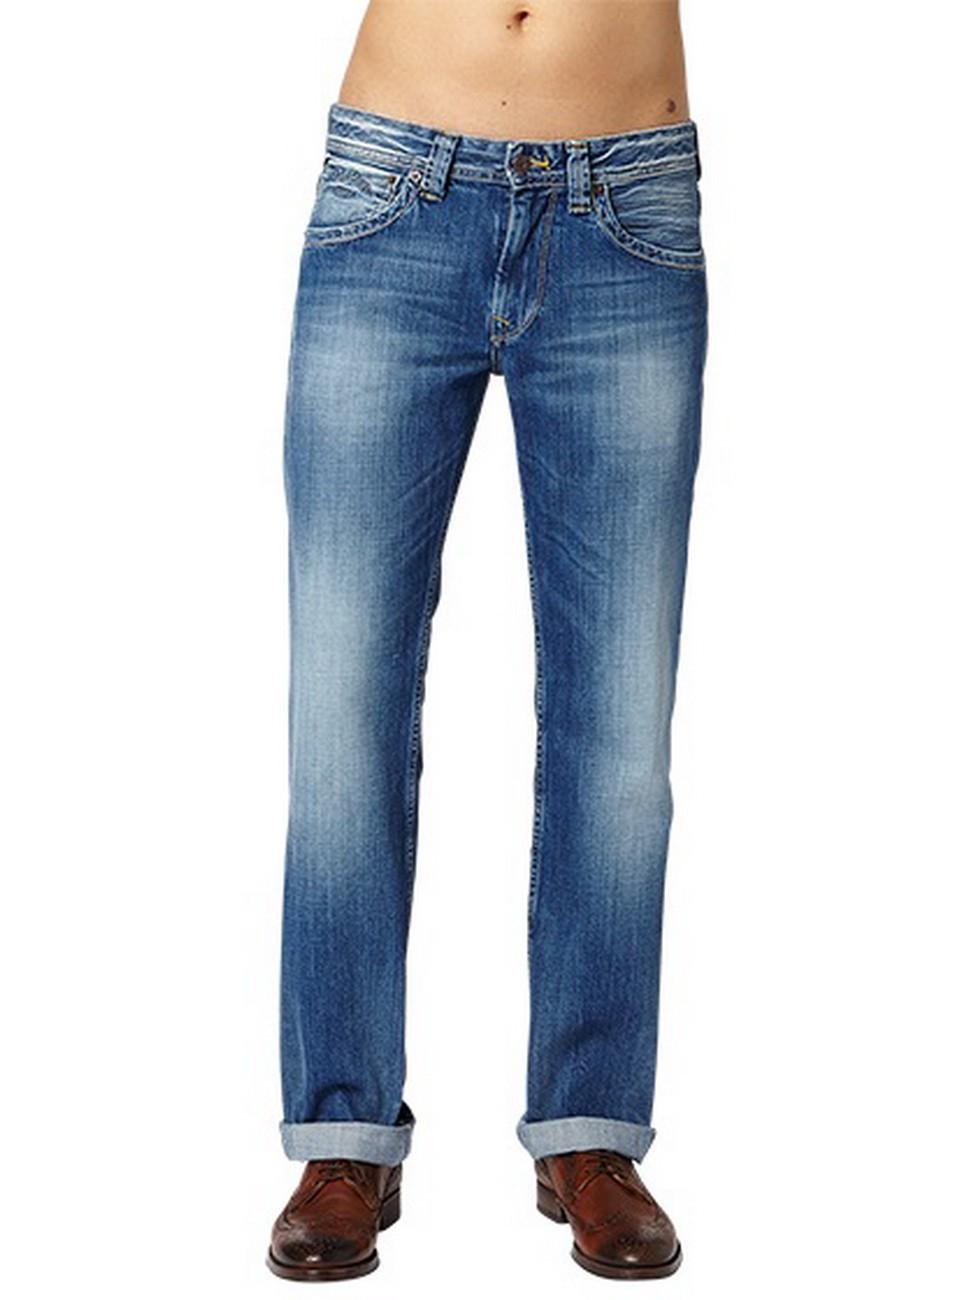 pepe jeans herren jeans kingston zip regular fit sanfore twist kaufen jeans direct de. Black Bedroom Furniture Sets. Home Design Ideas